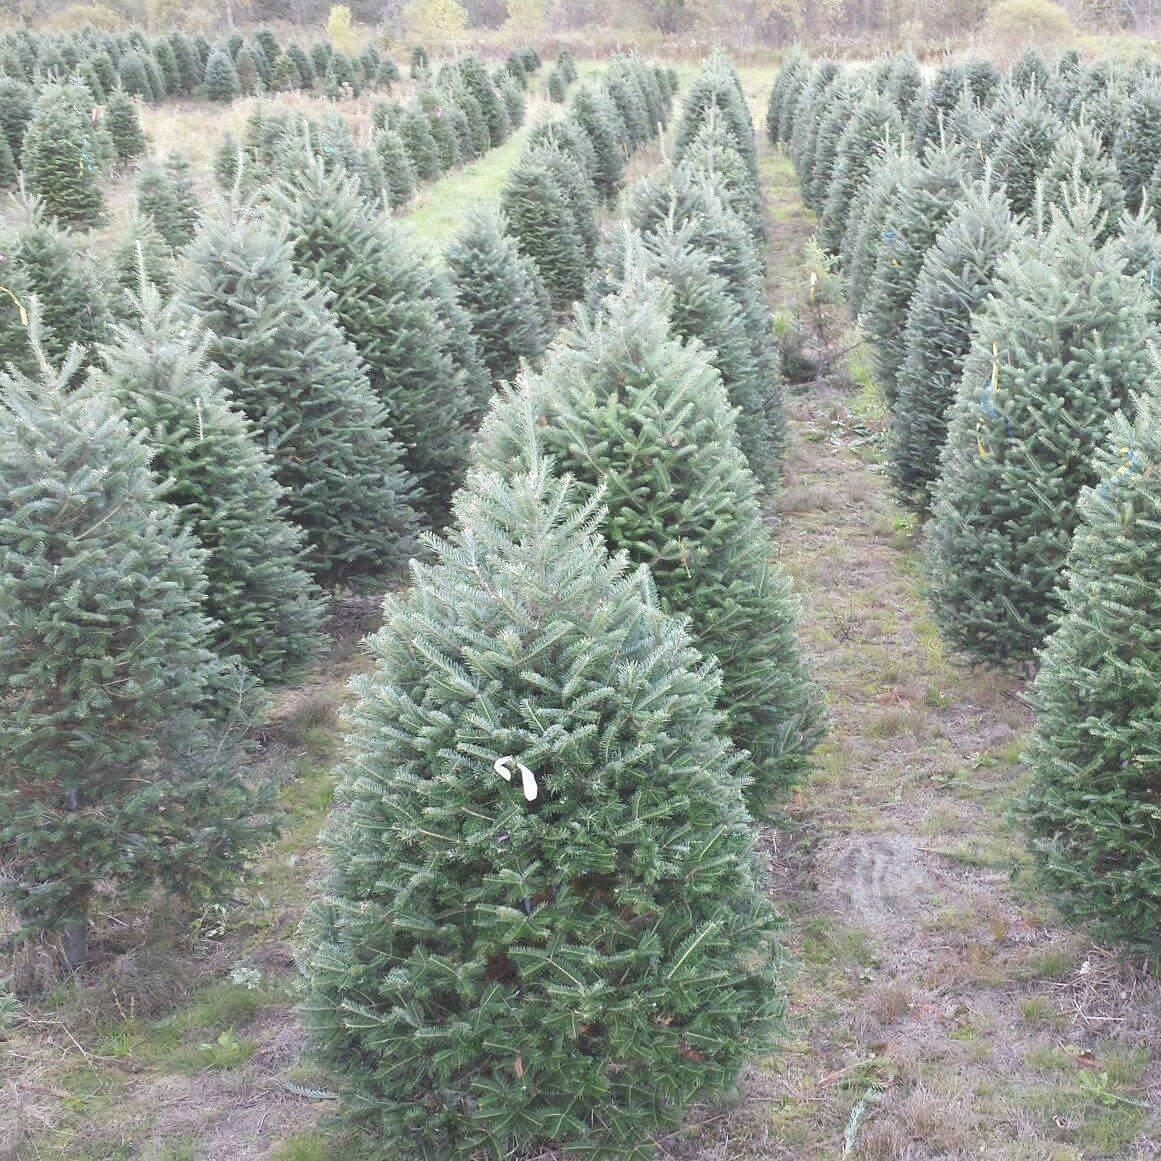 Sibgo Tree Company, Colebrook NH